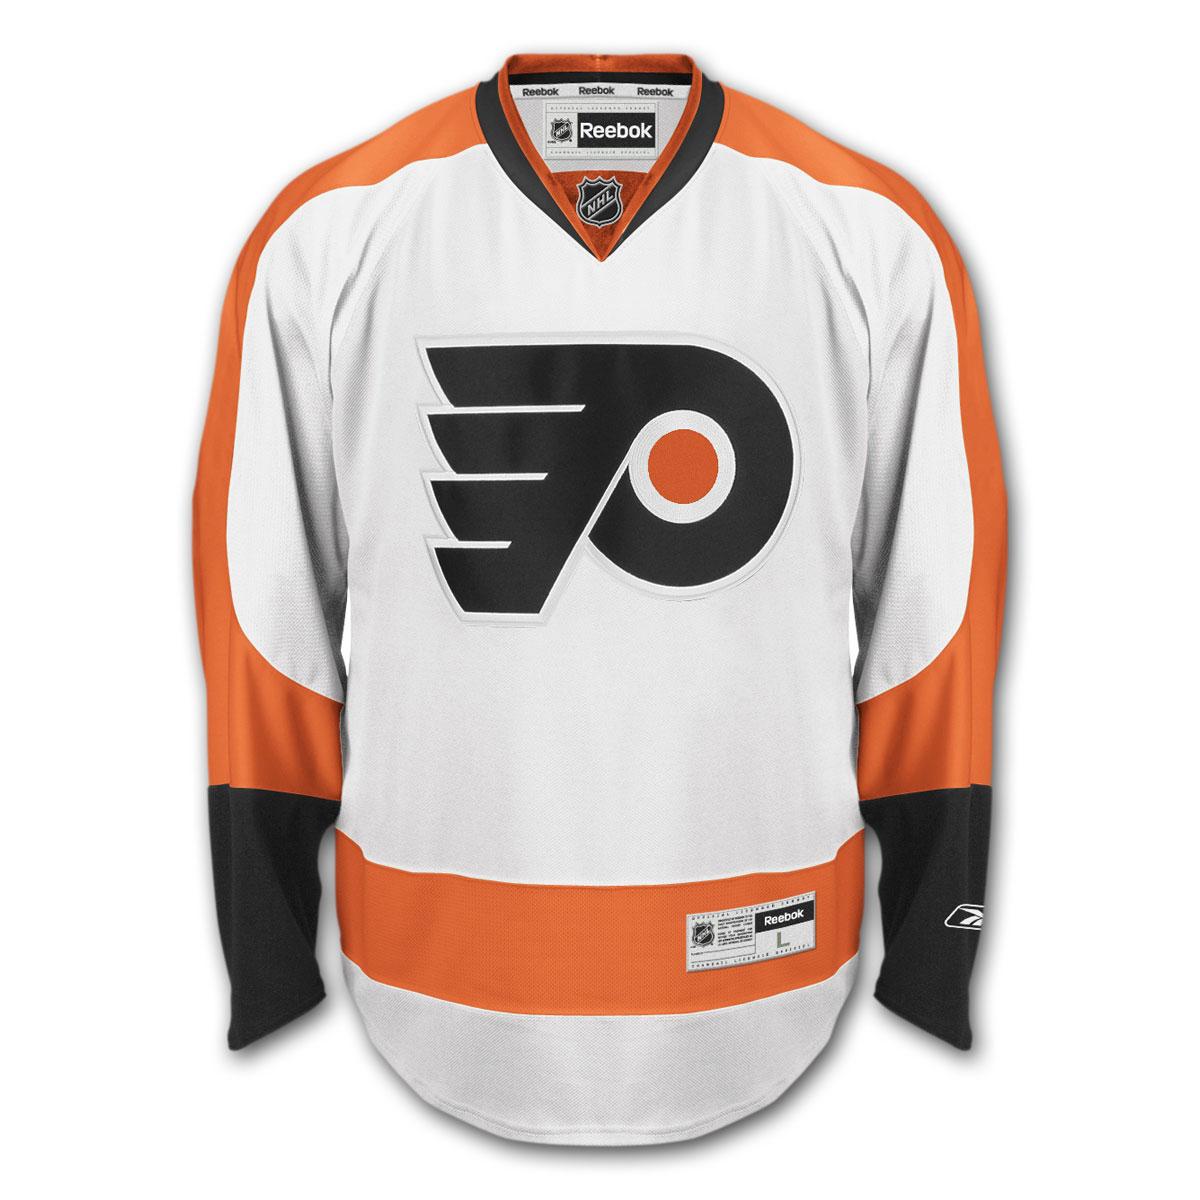 separation shoes 5071c 09302 Reebok NHL Replica Hockey Jersey - Philadelphia Flyers